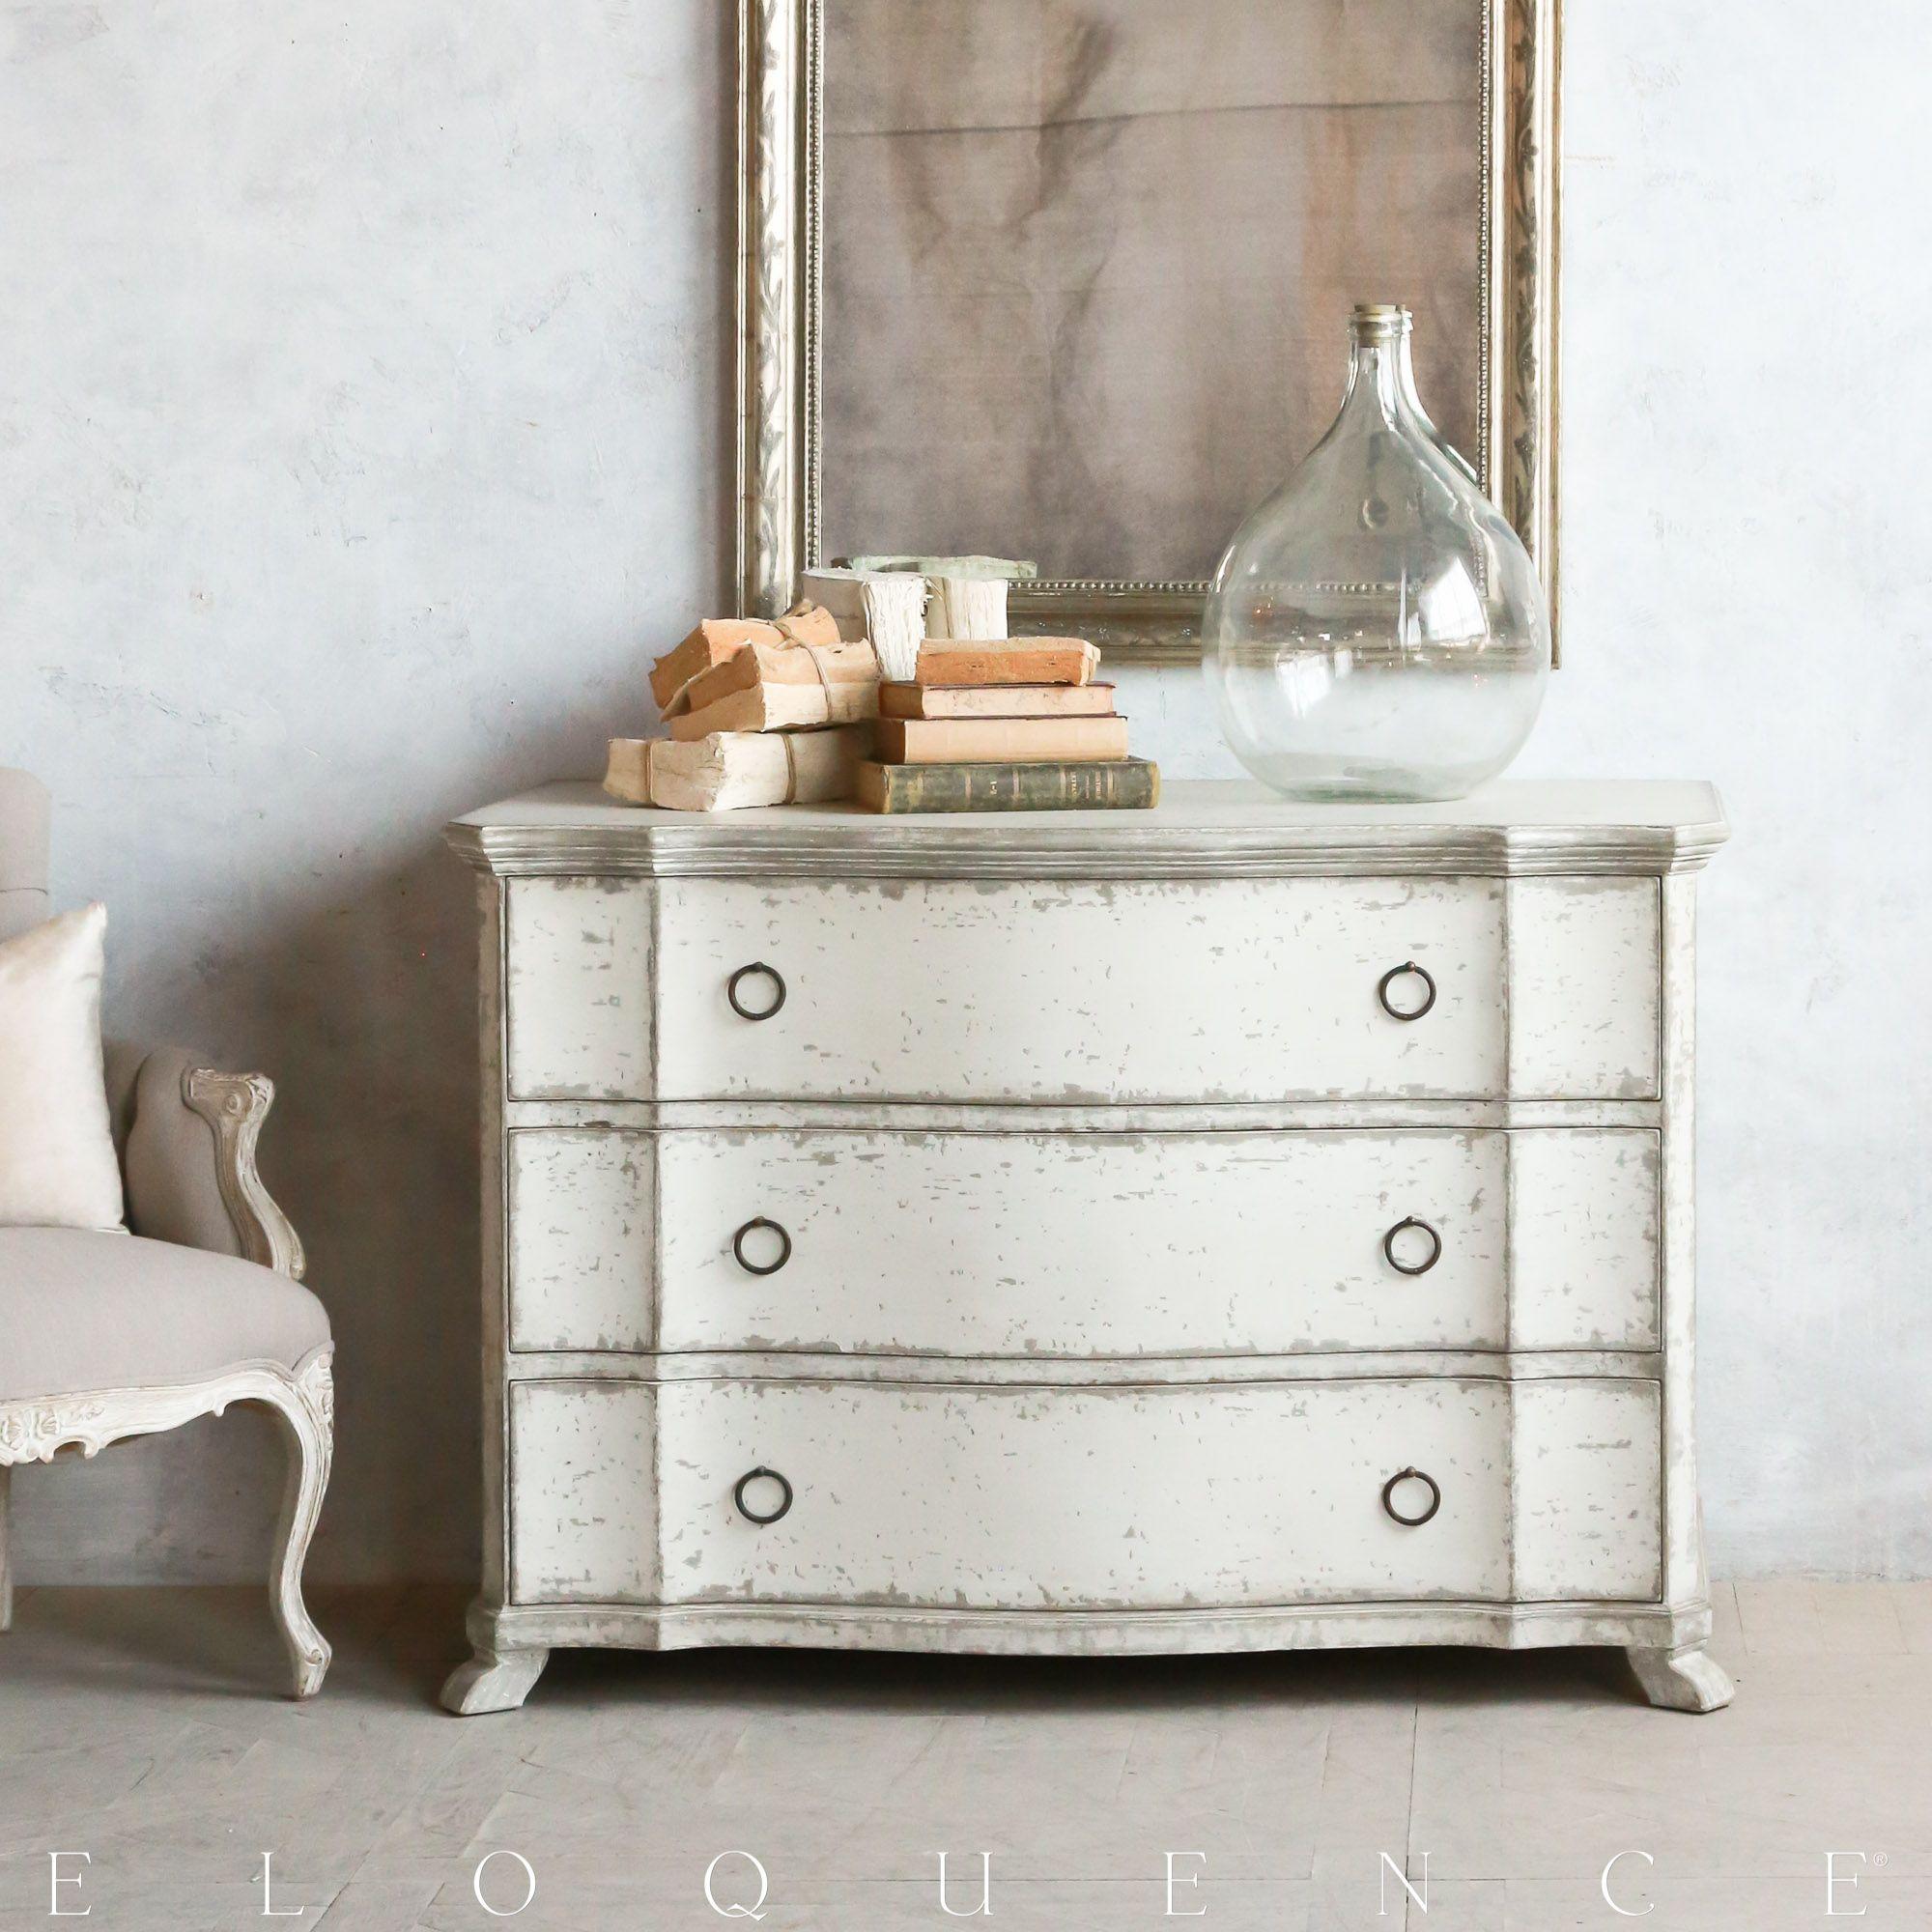 Eloquence, Inc. New bedroom design, Furniture, Furniture